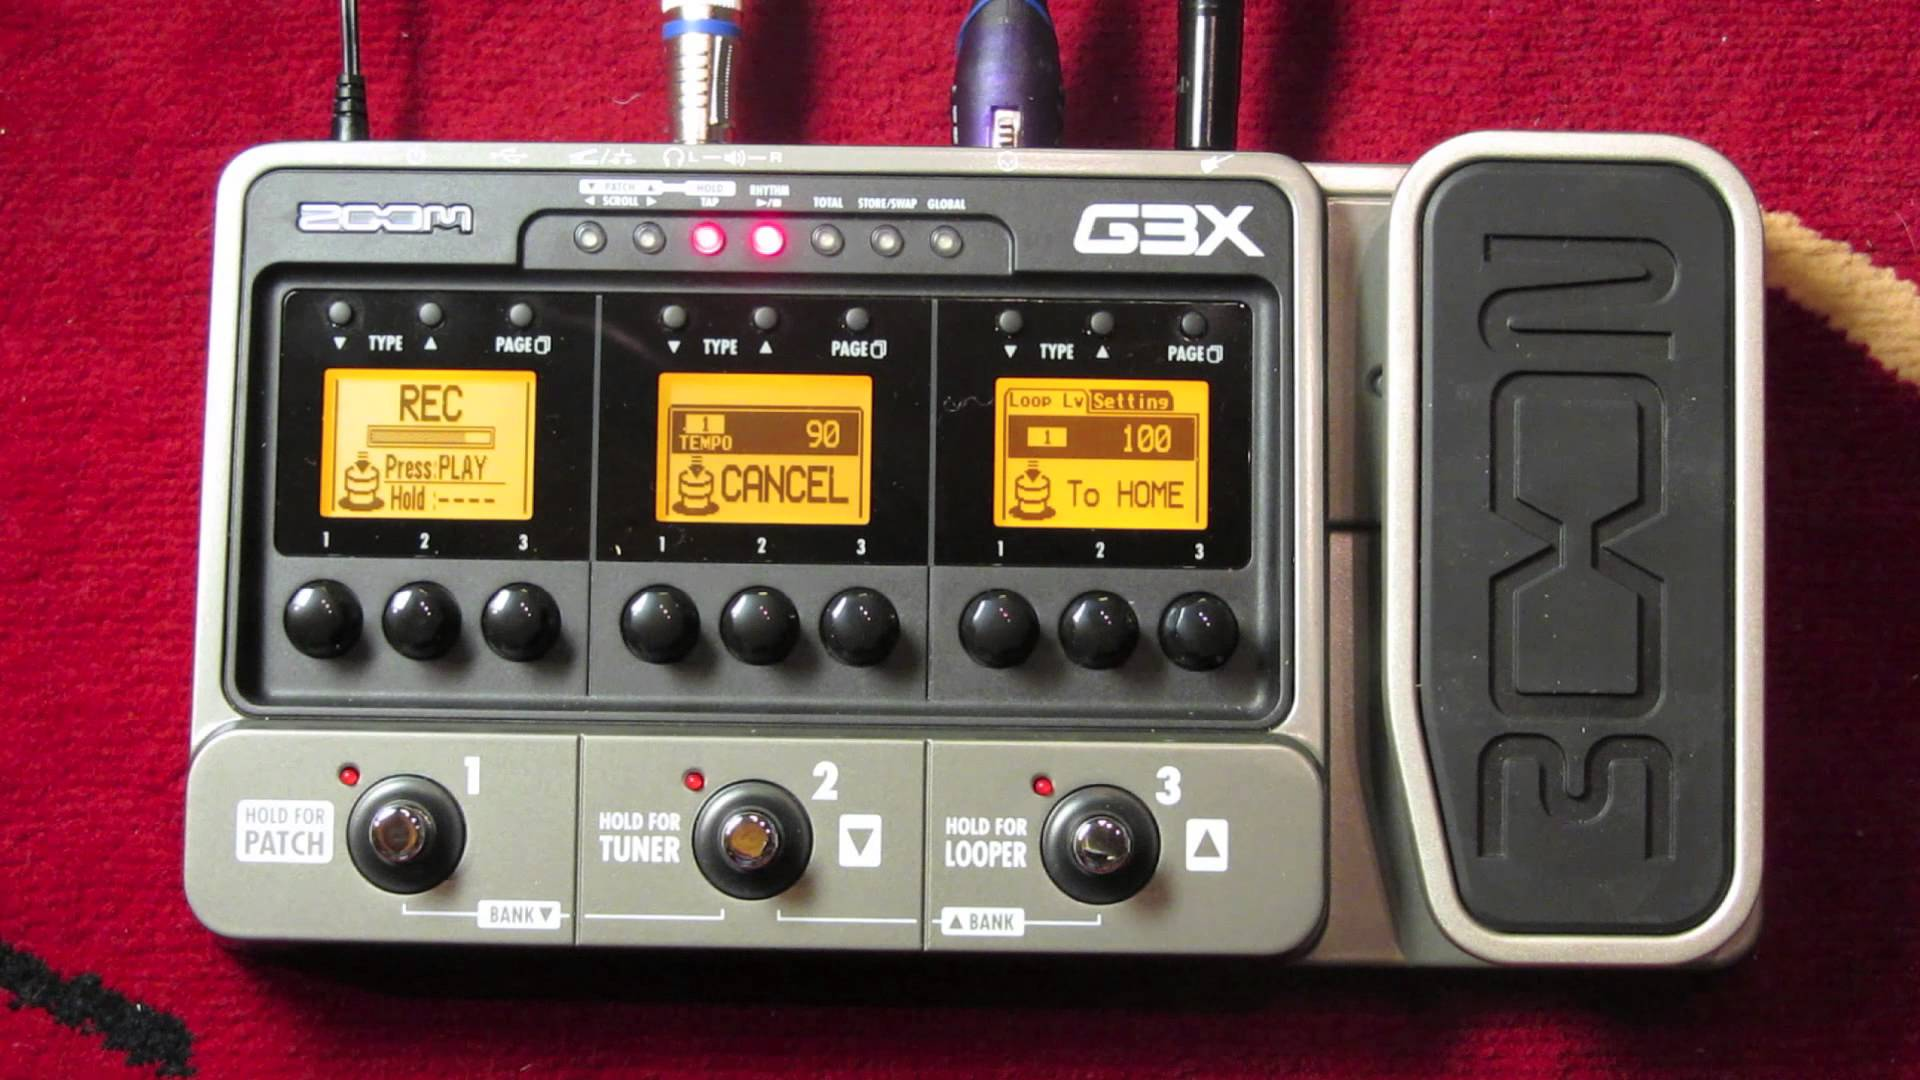 Zoom G3X Vs G3Xn 2